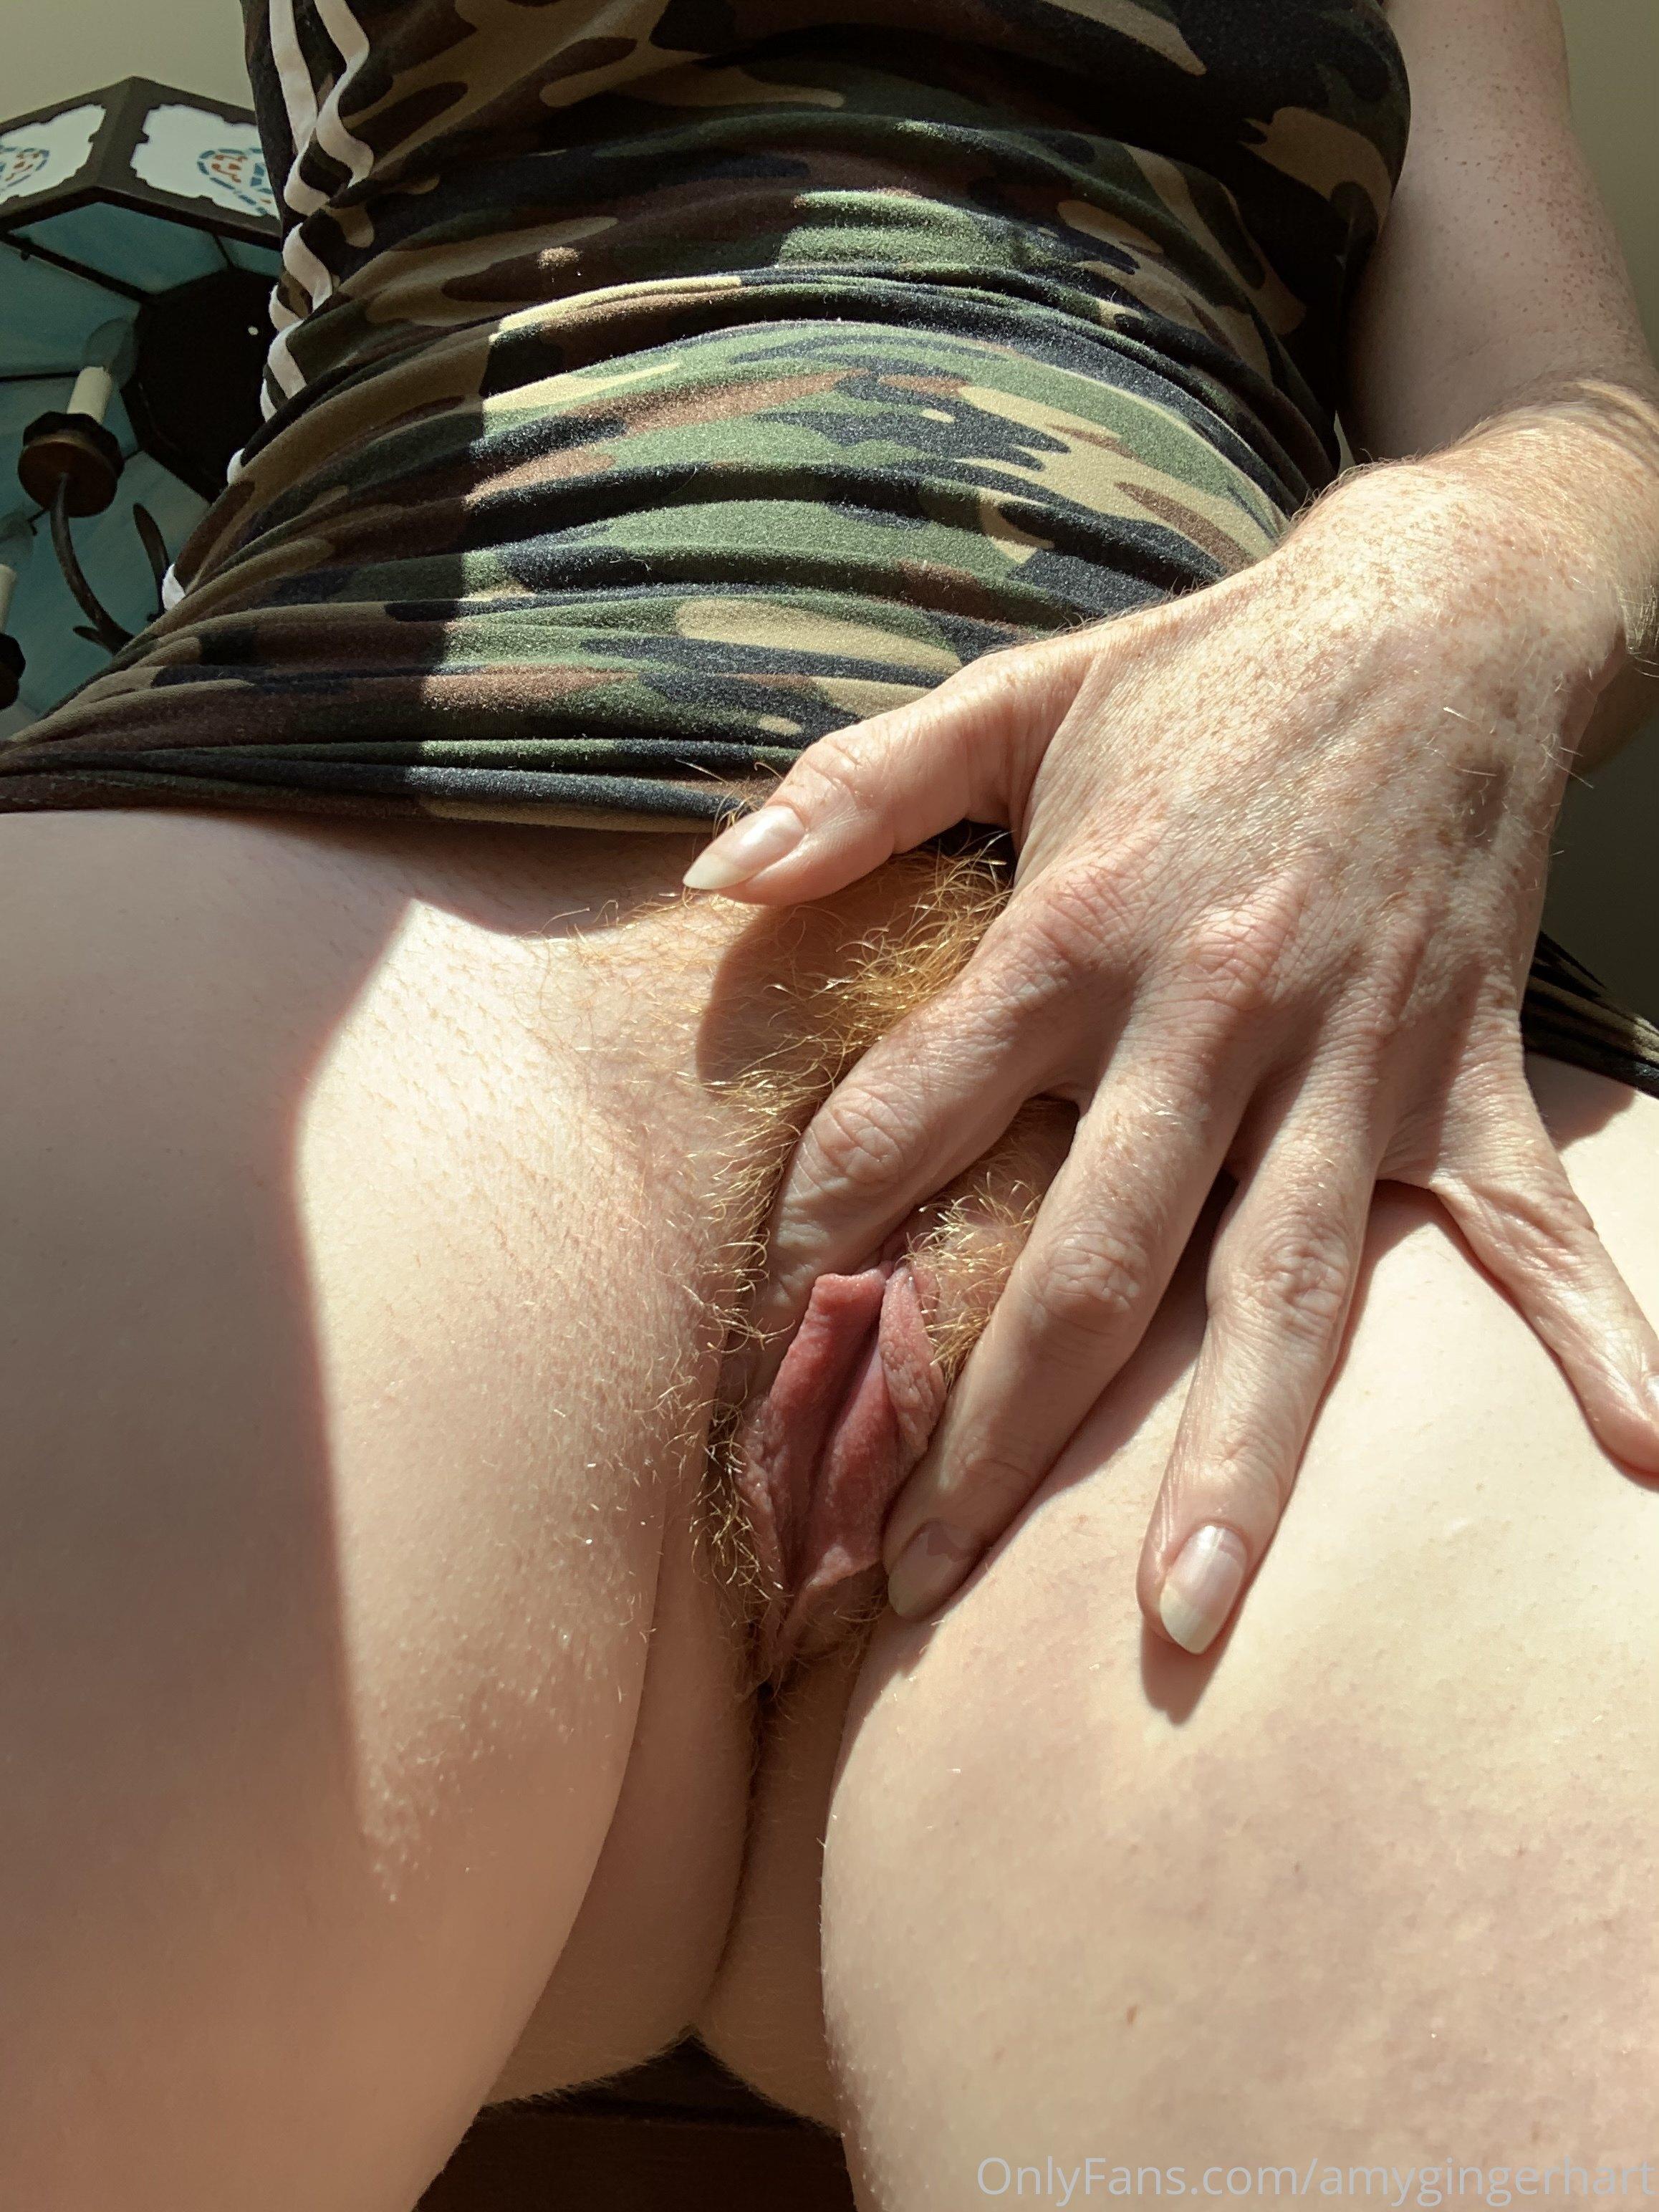 Amy Hart, Amygingerhart, Onlyfans 0290